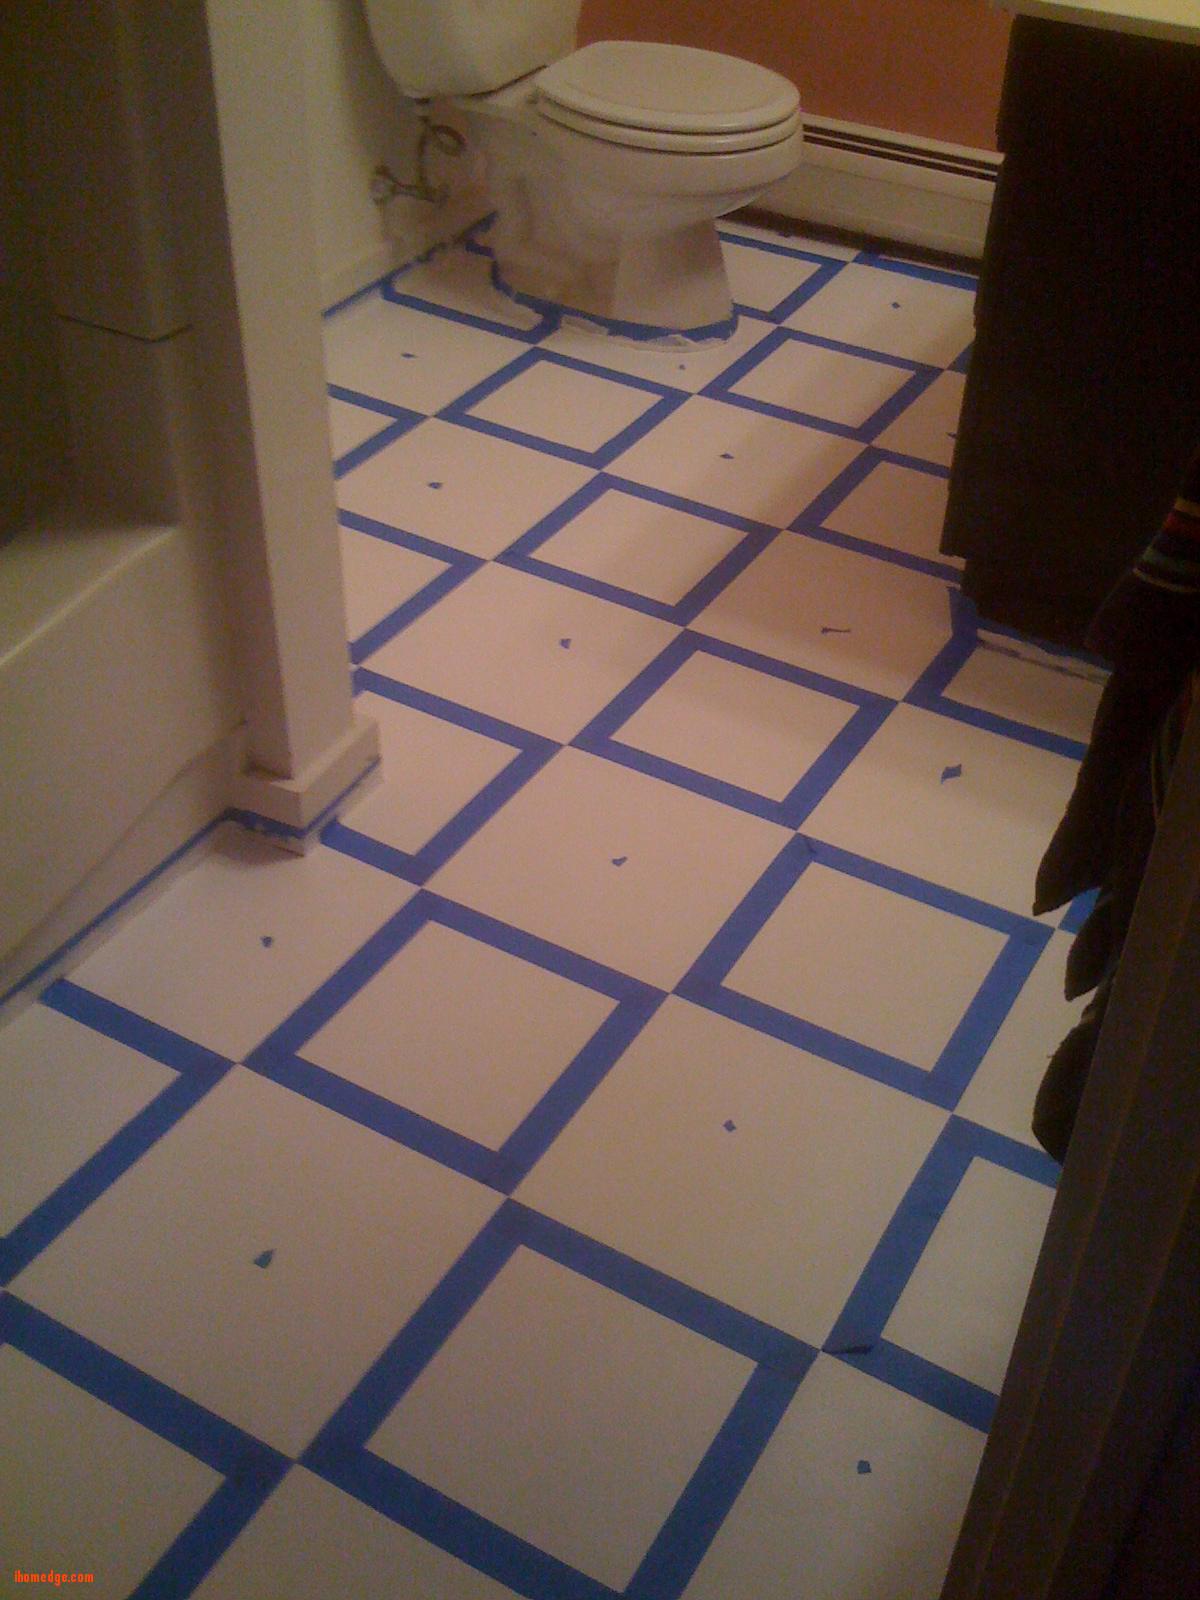 Pin by ihomedge on Bathroom | Pinterest | Paint bathroom tiles ...